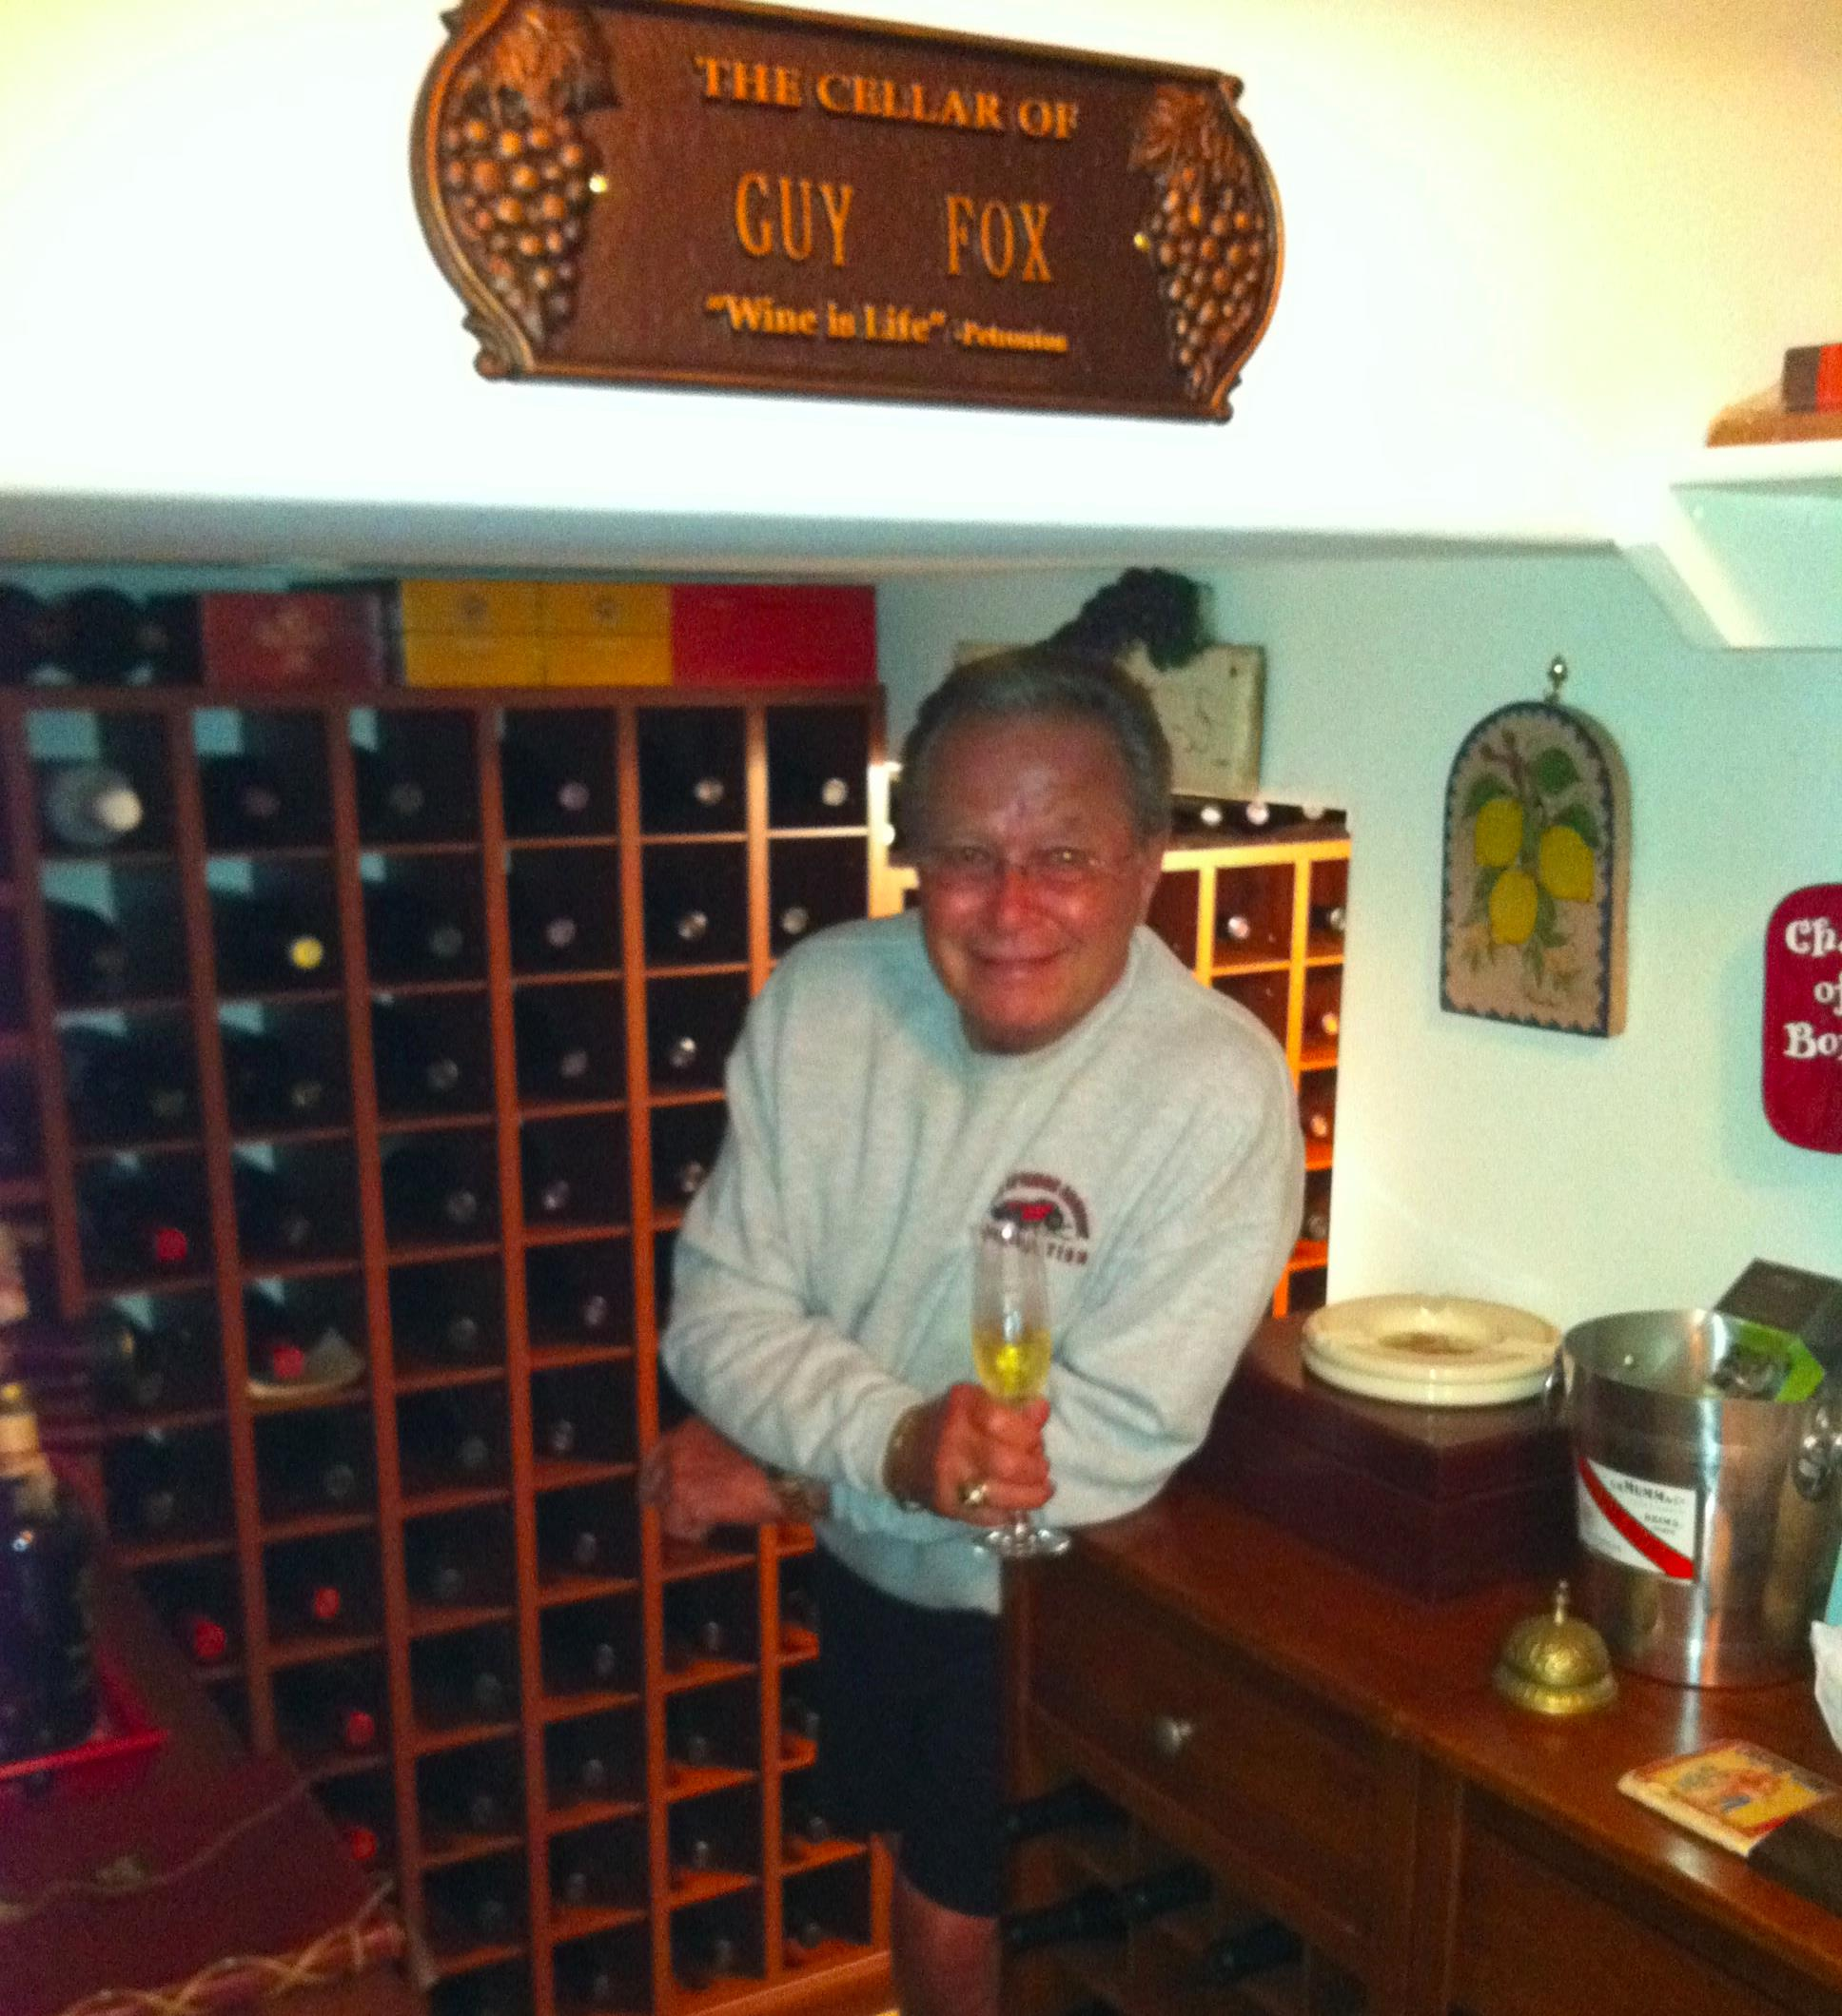 Guy Fox's Wine Cellar